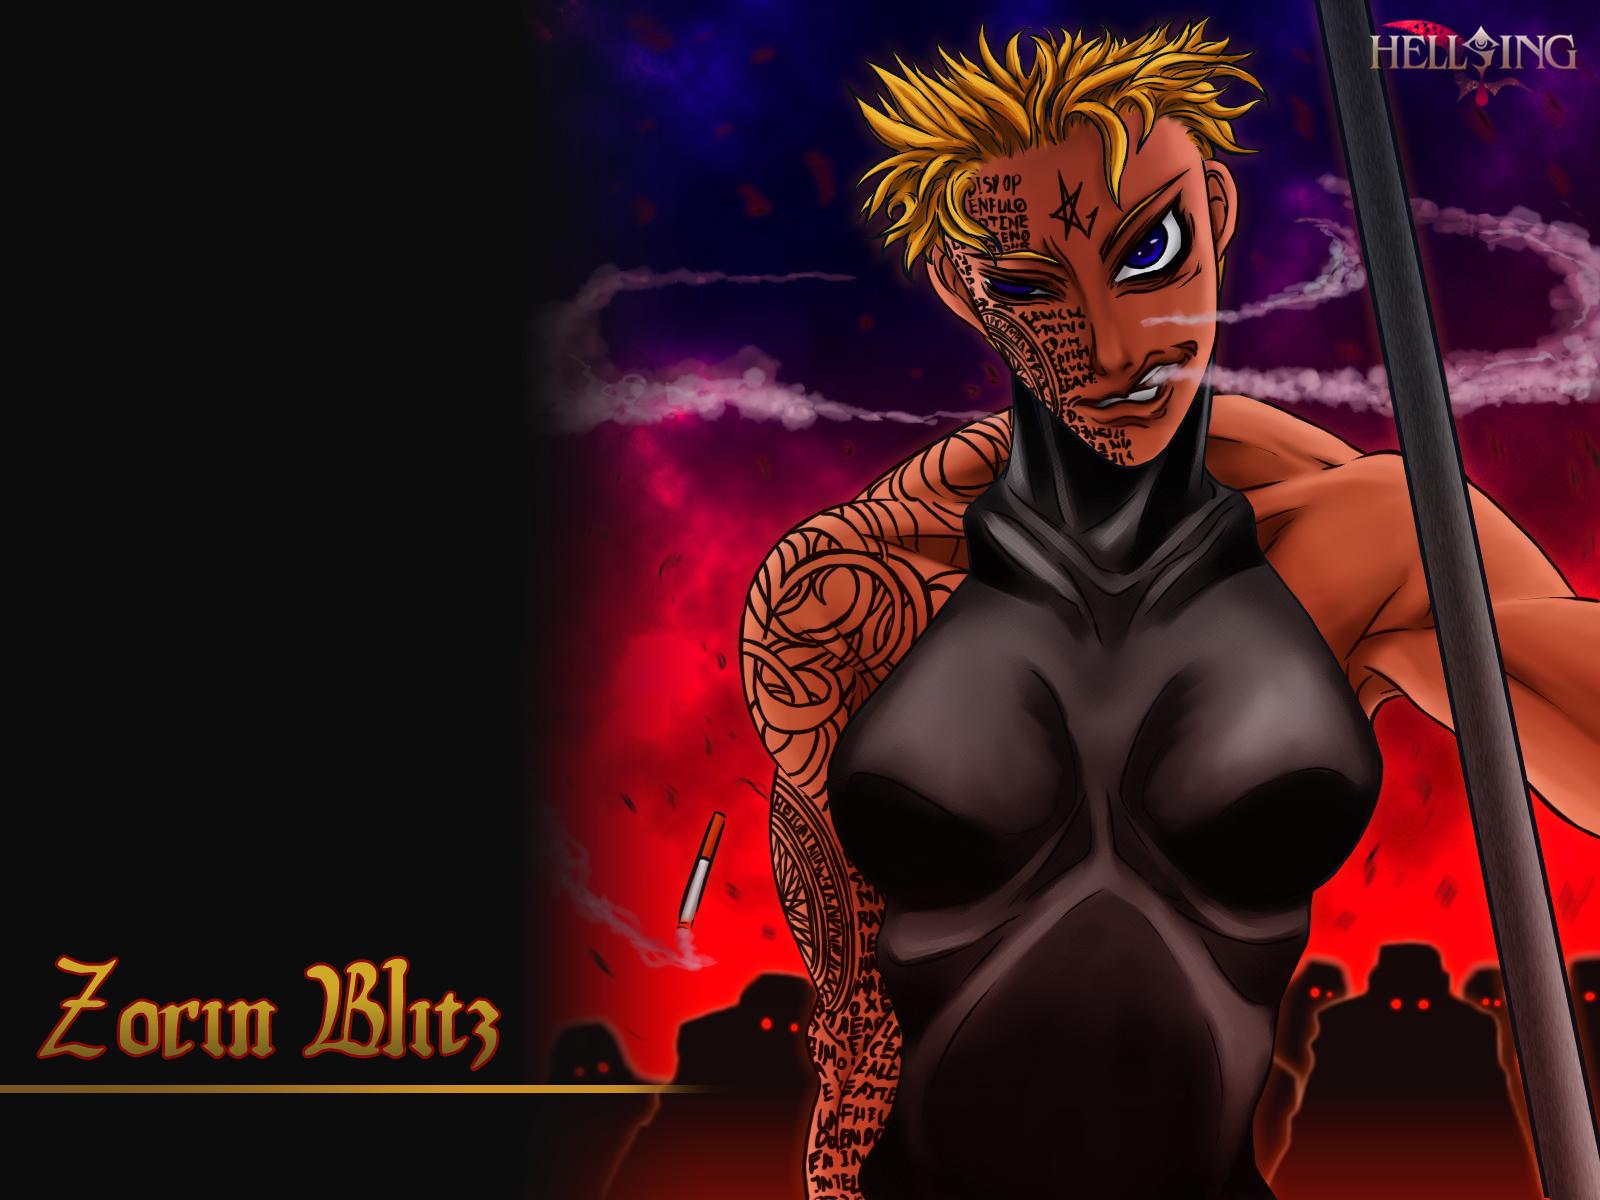 Zorin Blitz by ChronoTata